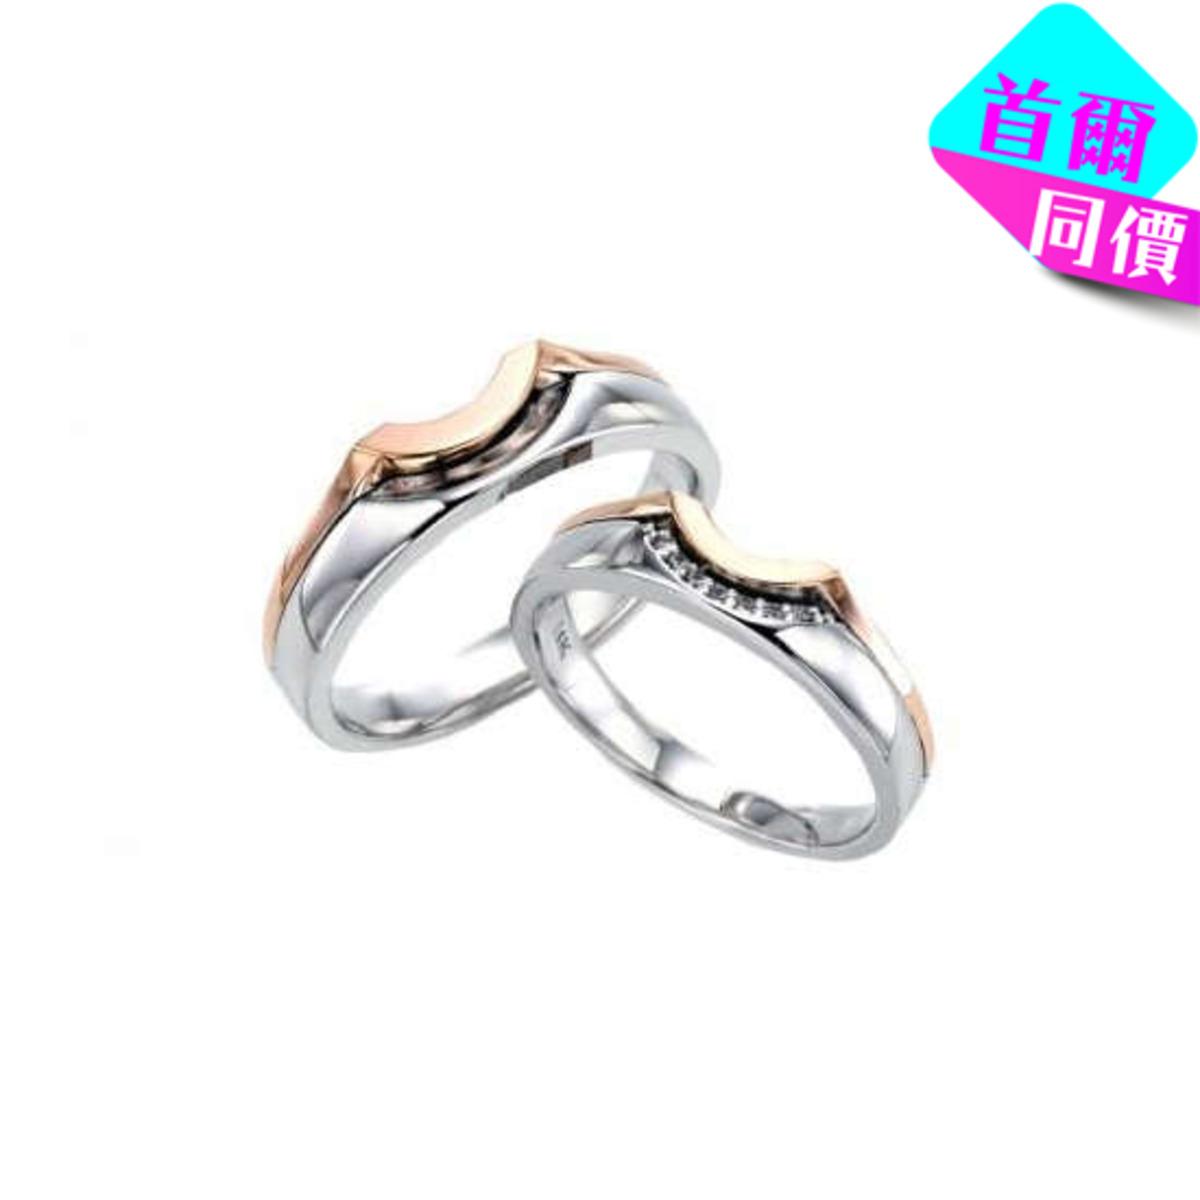 14K 雙色彎紋情侶戒指 (男款)